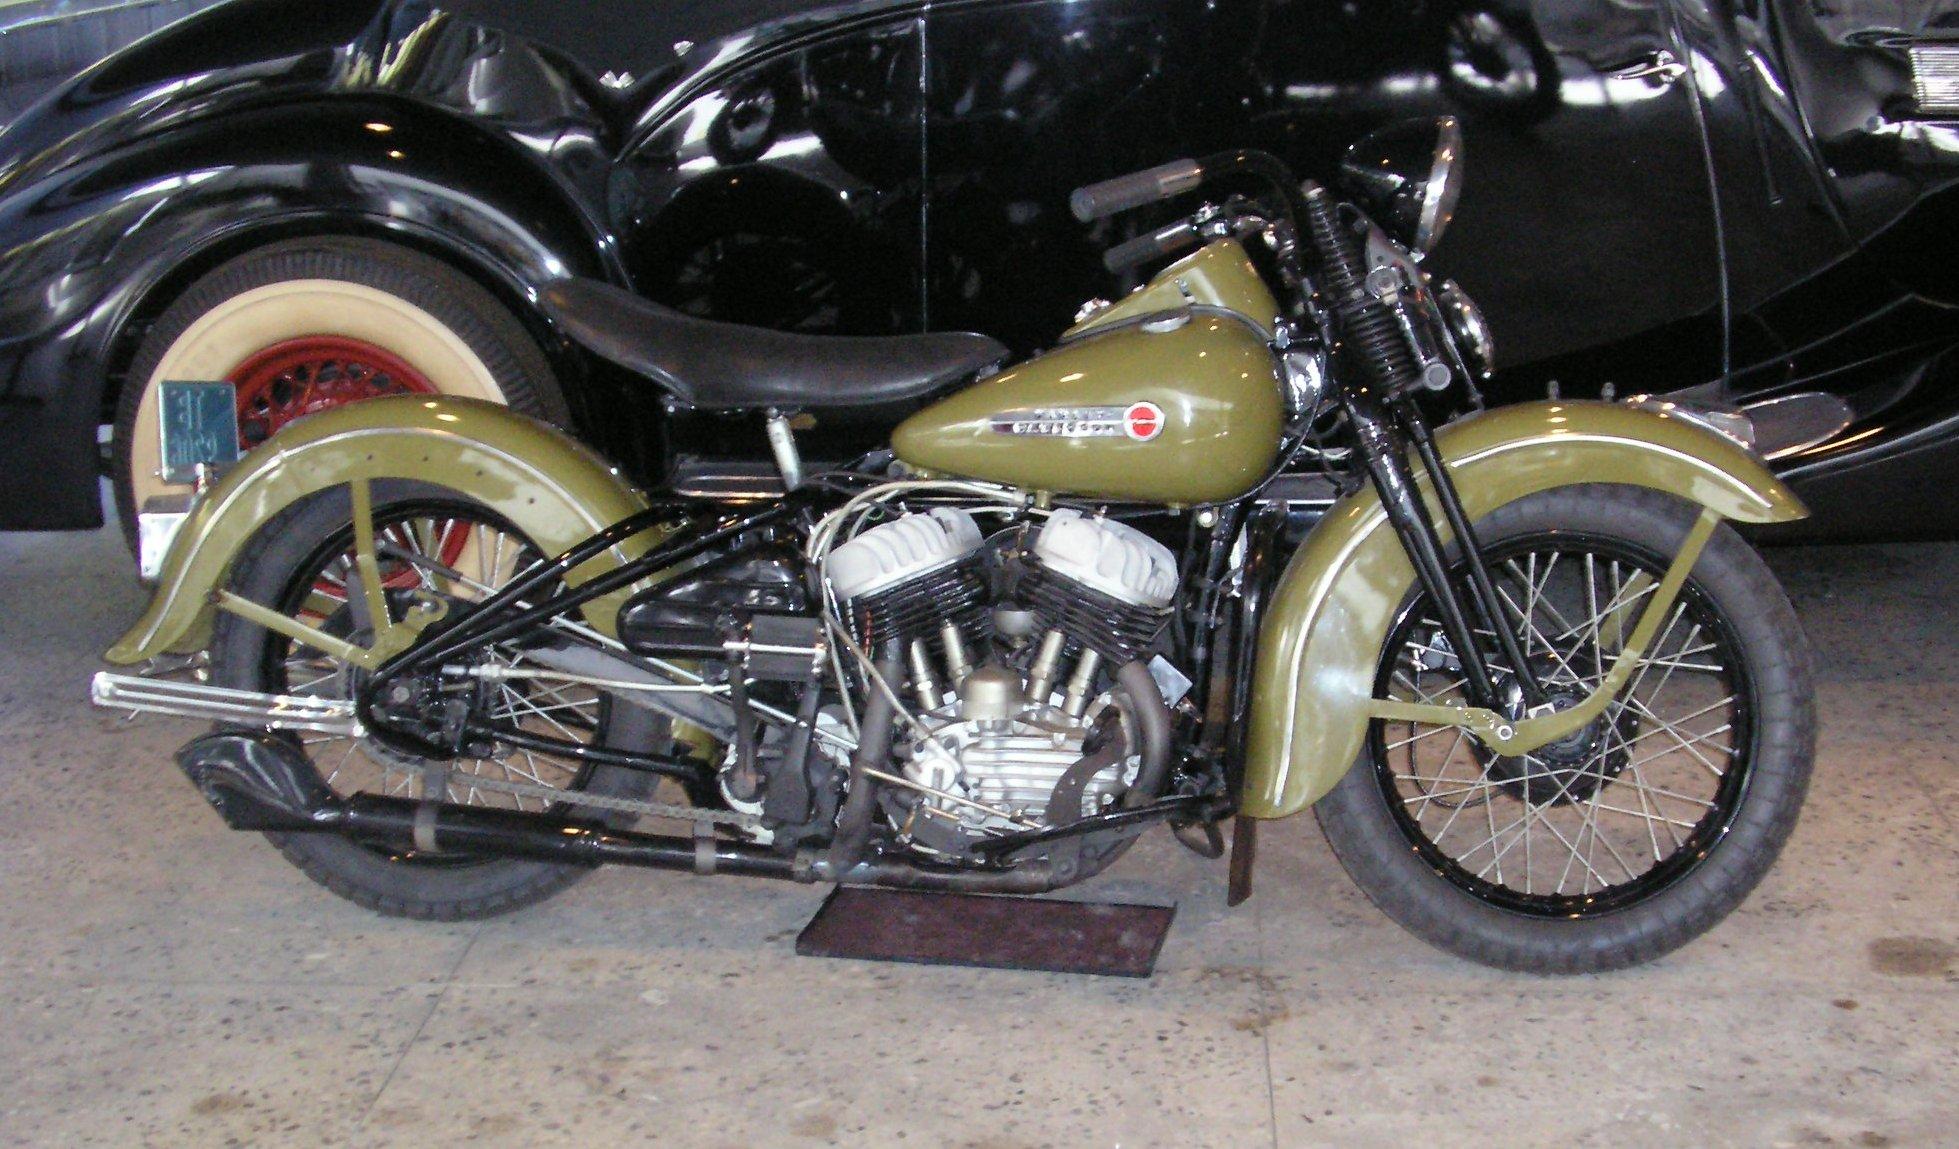 File:Harley-Davidson-WL.jpg - Wikimedia Commons